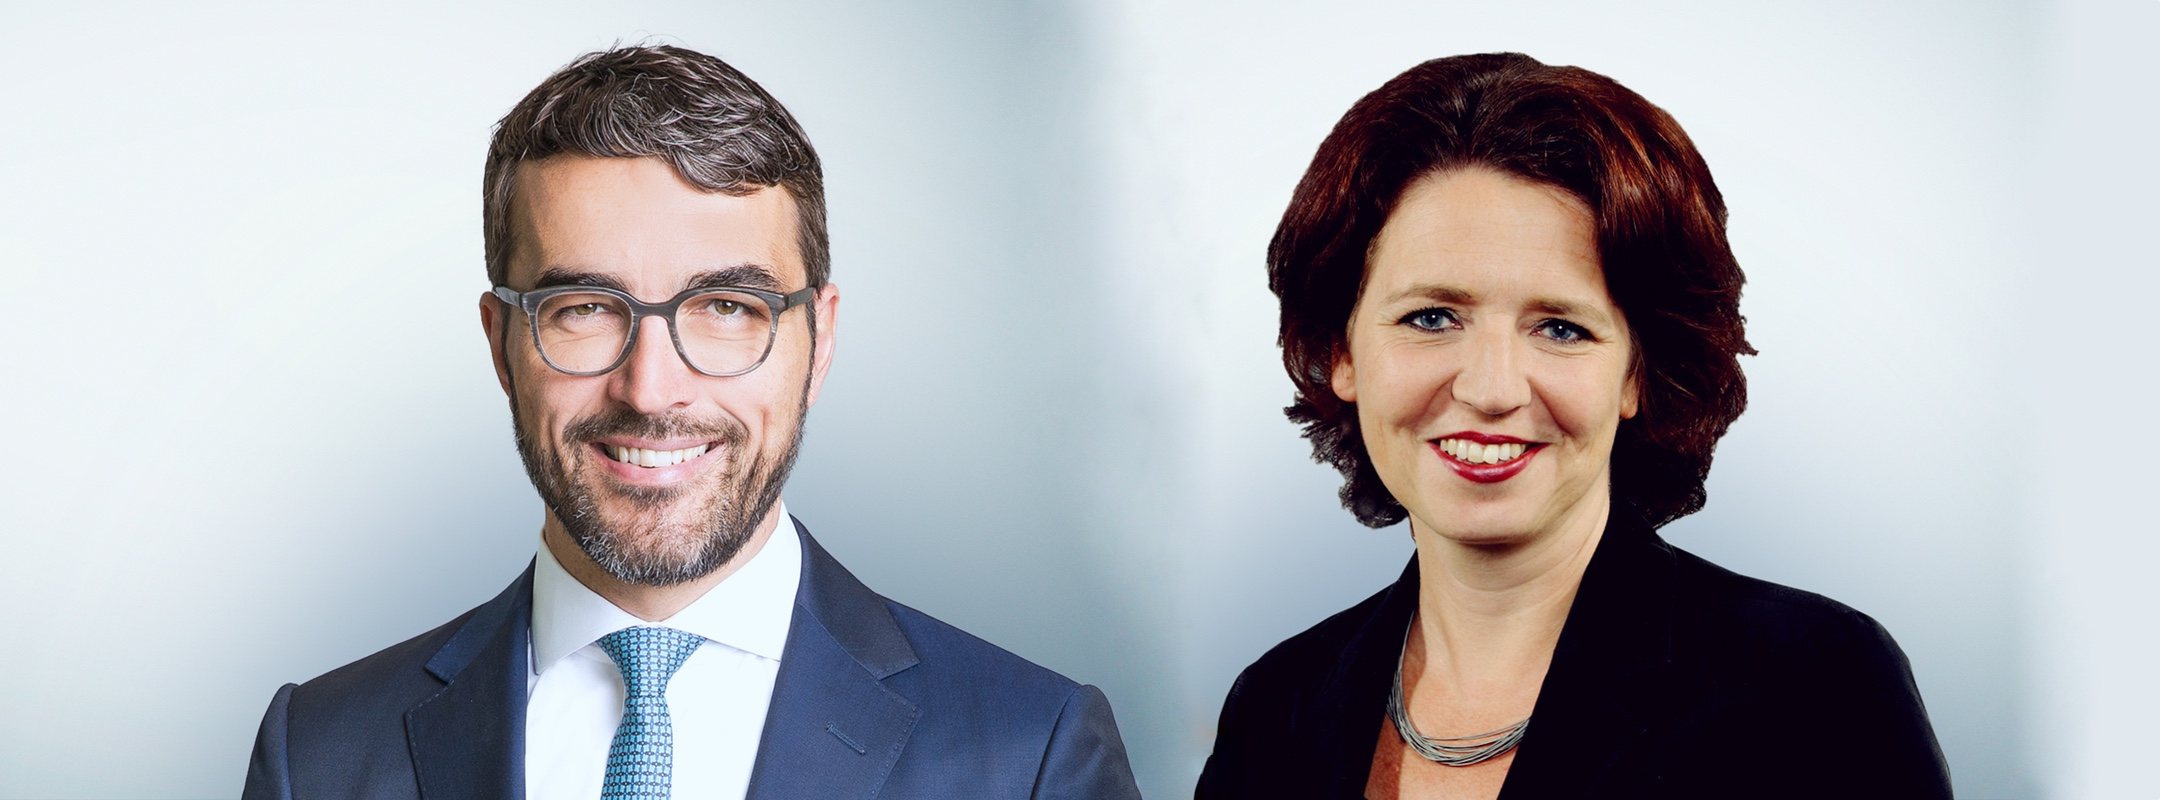 Freshfields Mario Hüther und Christina Spenke